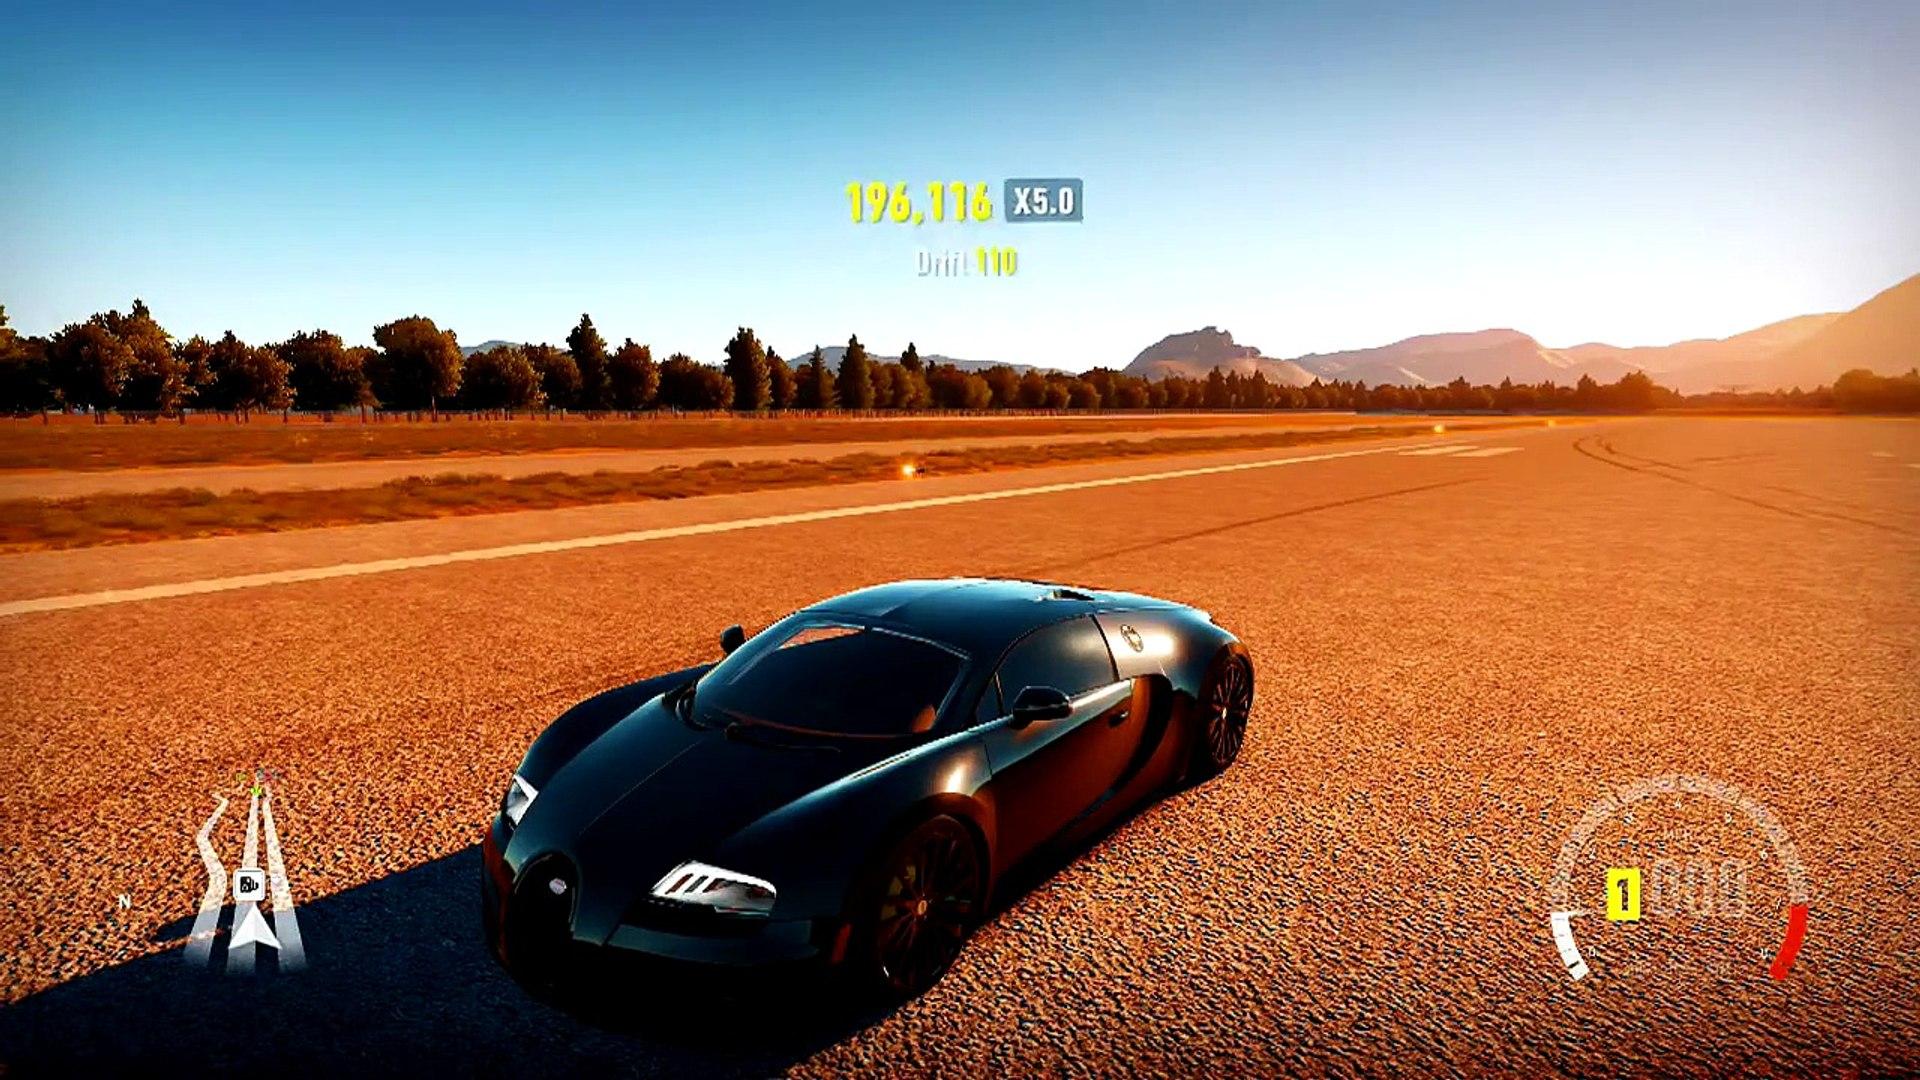 Forza Horizon 2 - Fastest Way To Level Up & Earn Skill Points! (Forza  Horizon 2 Unlimited XP)